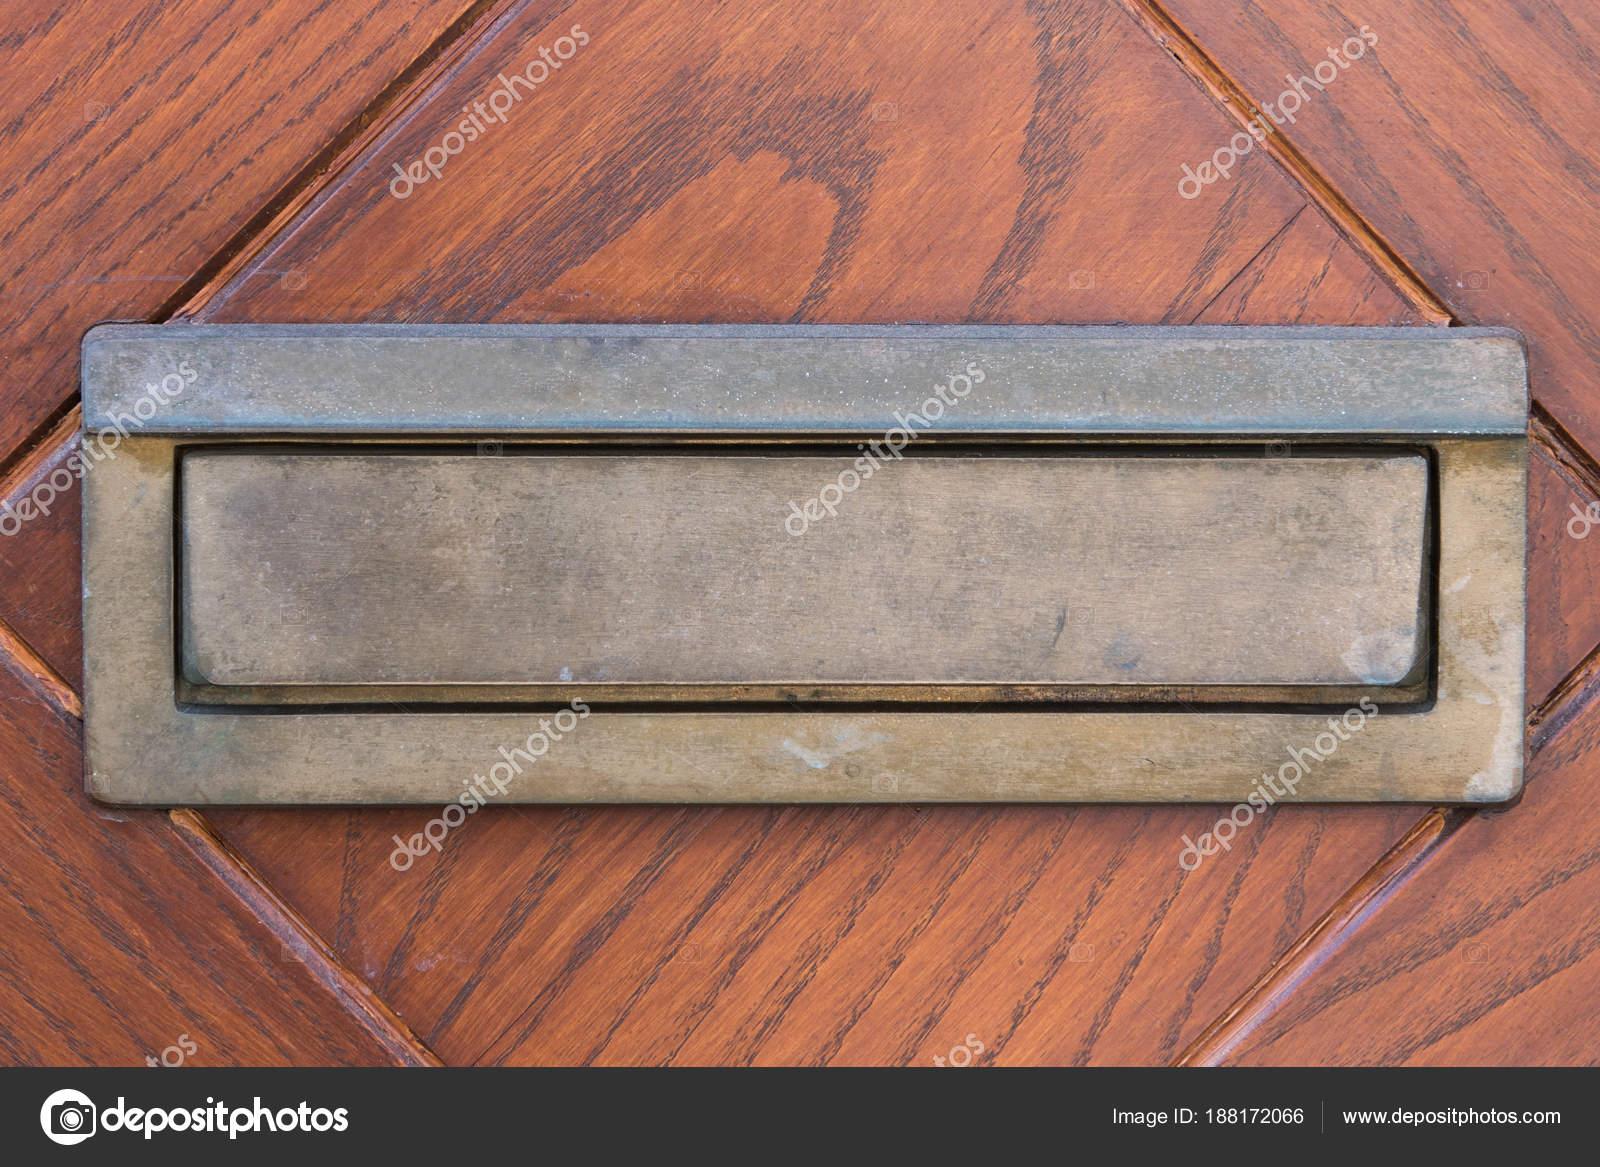 Small Silver Door Mailbox Wooden Doors Small Letterbox u2014 Stock Photo & Small Silver Door Mailbox Wooden Doors Small Letterbox u2014 Stock Photo ...